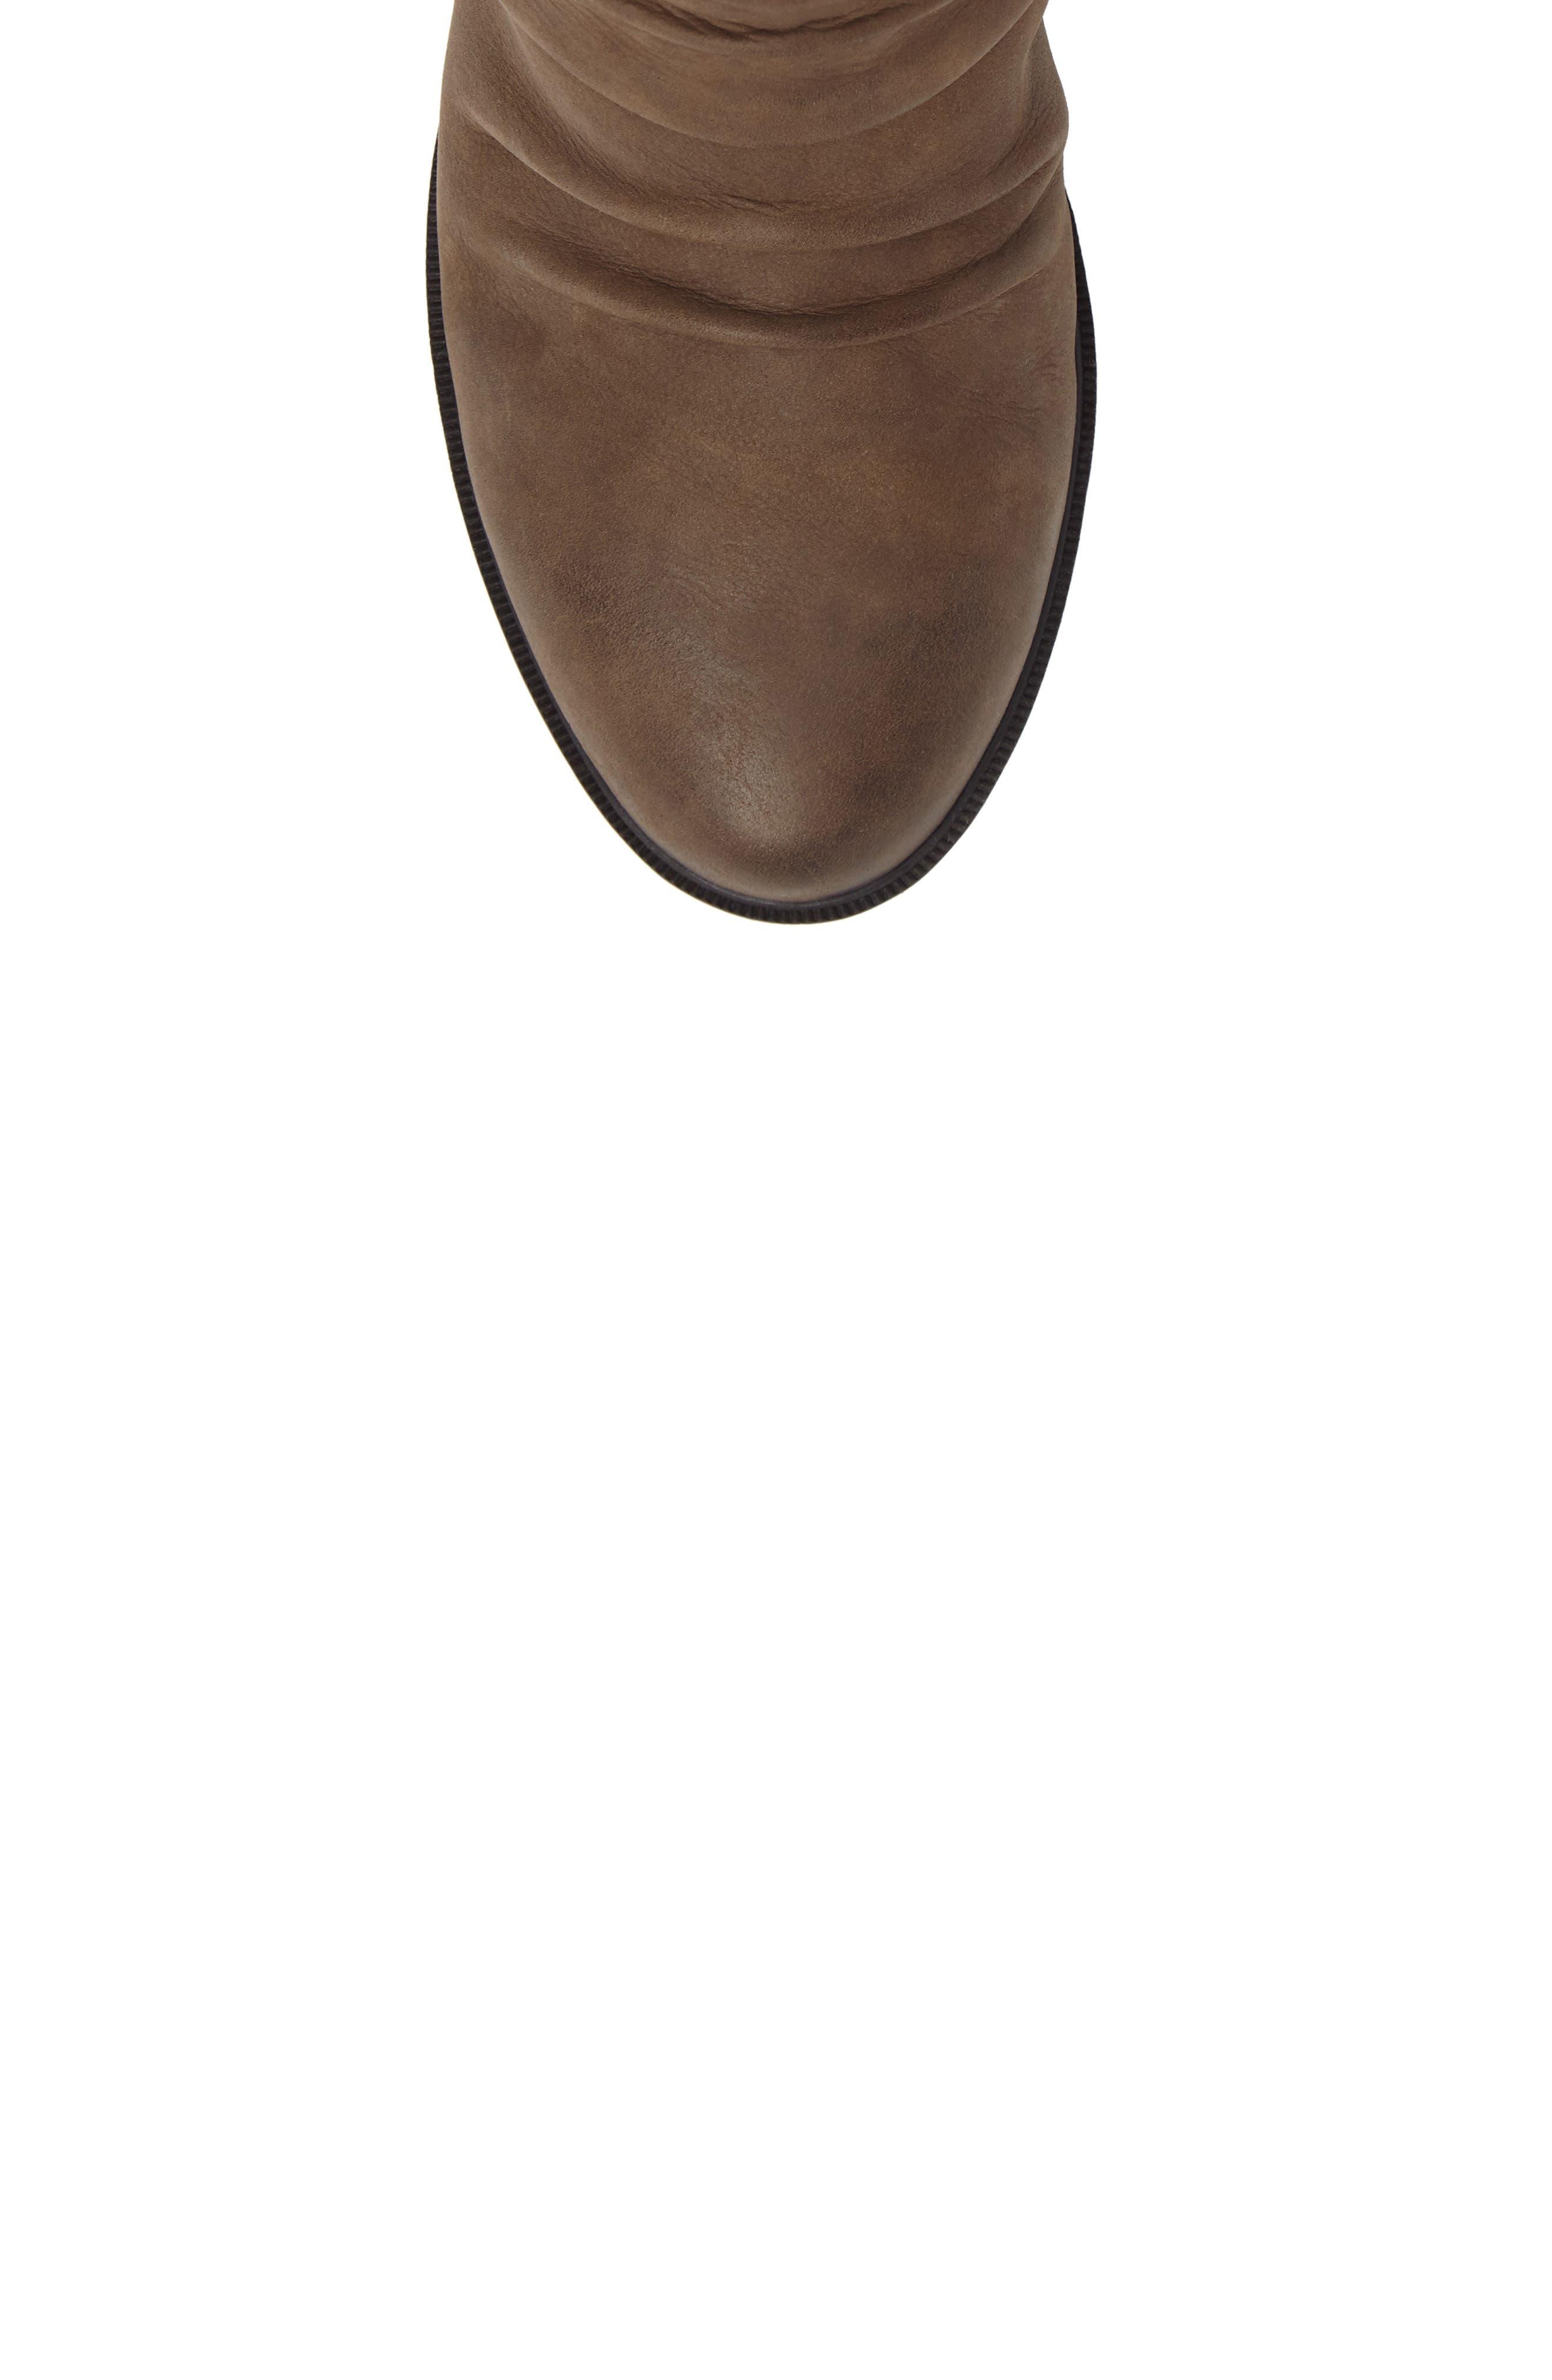 Natashya Slouchy Block Heel Bootie,                             Alternate thumbnail 5, color,                             Stone Nubuck